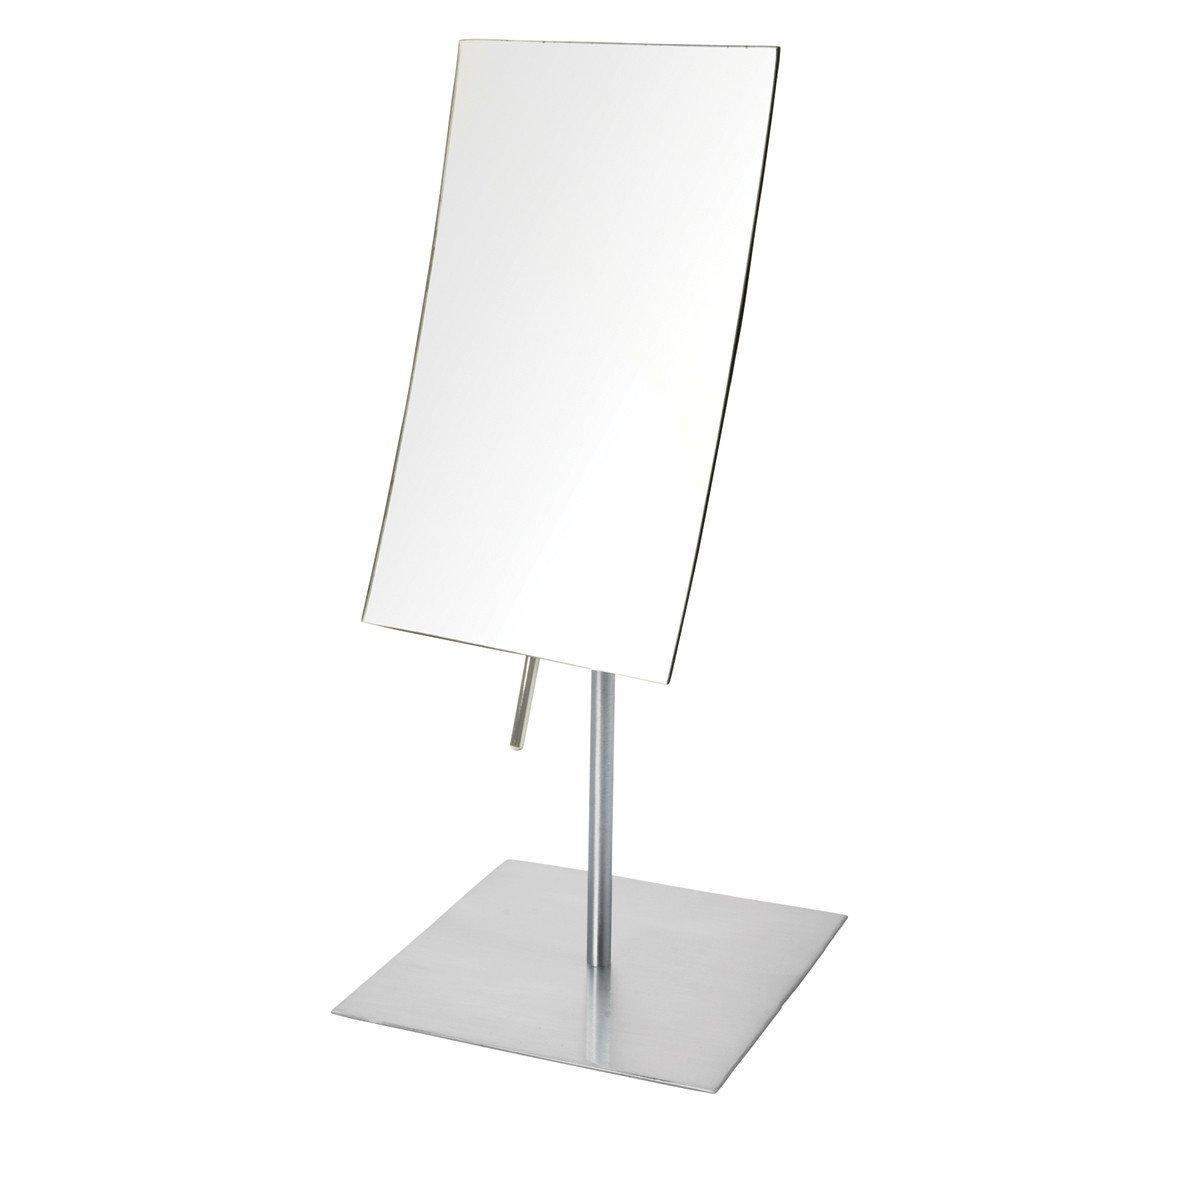 Jerdon JP358N 3X Magnified Tabletop Rectangular Adjustable Mirror, Nickel, 51.2 Ounce